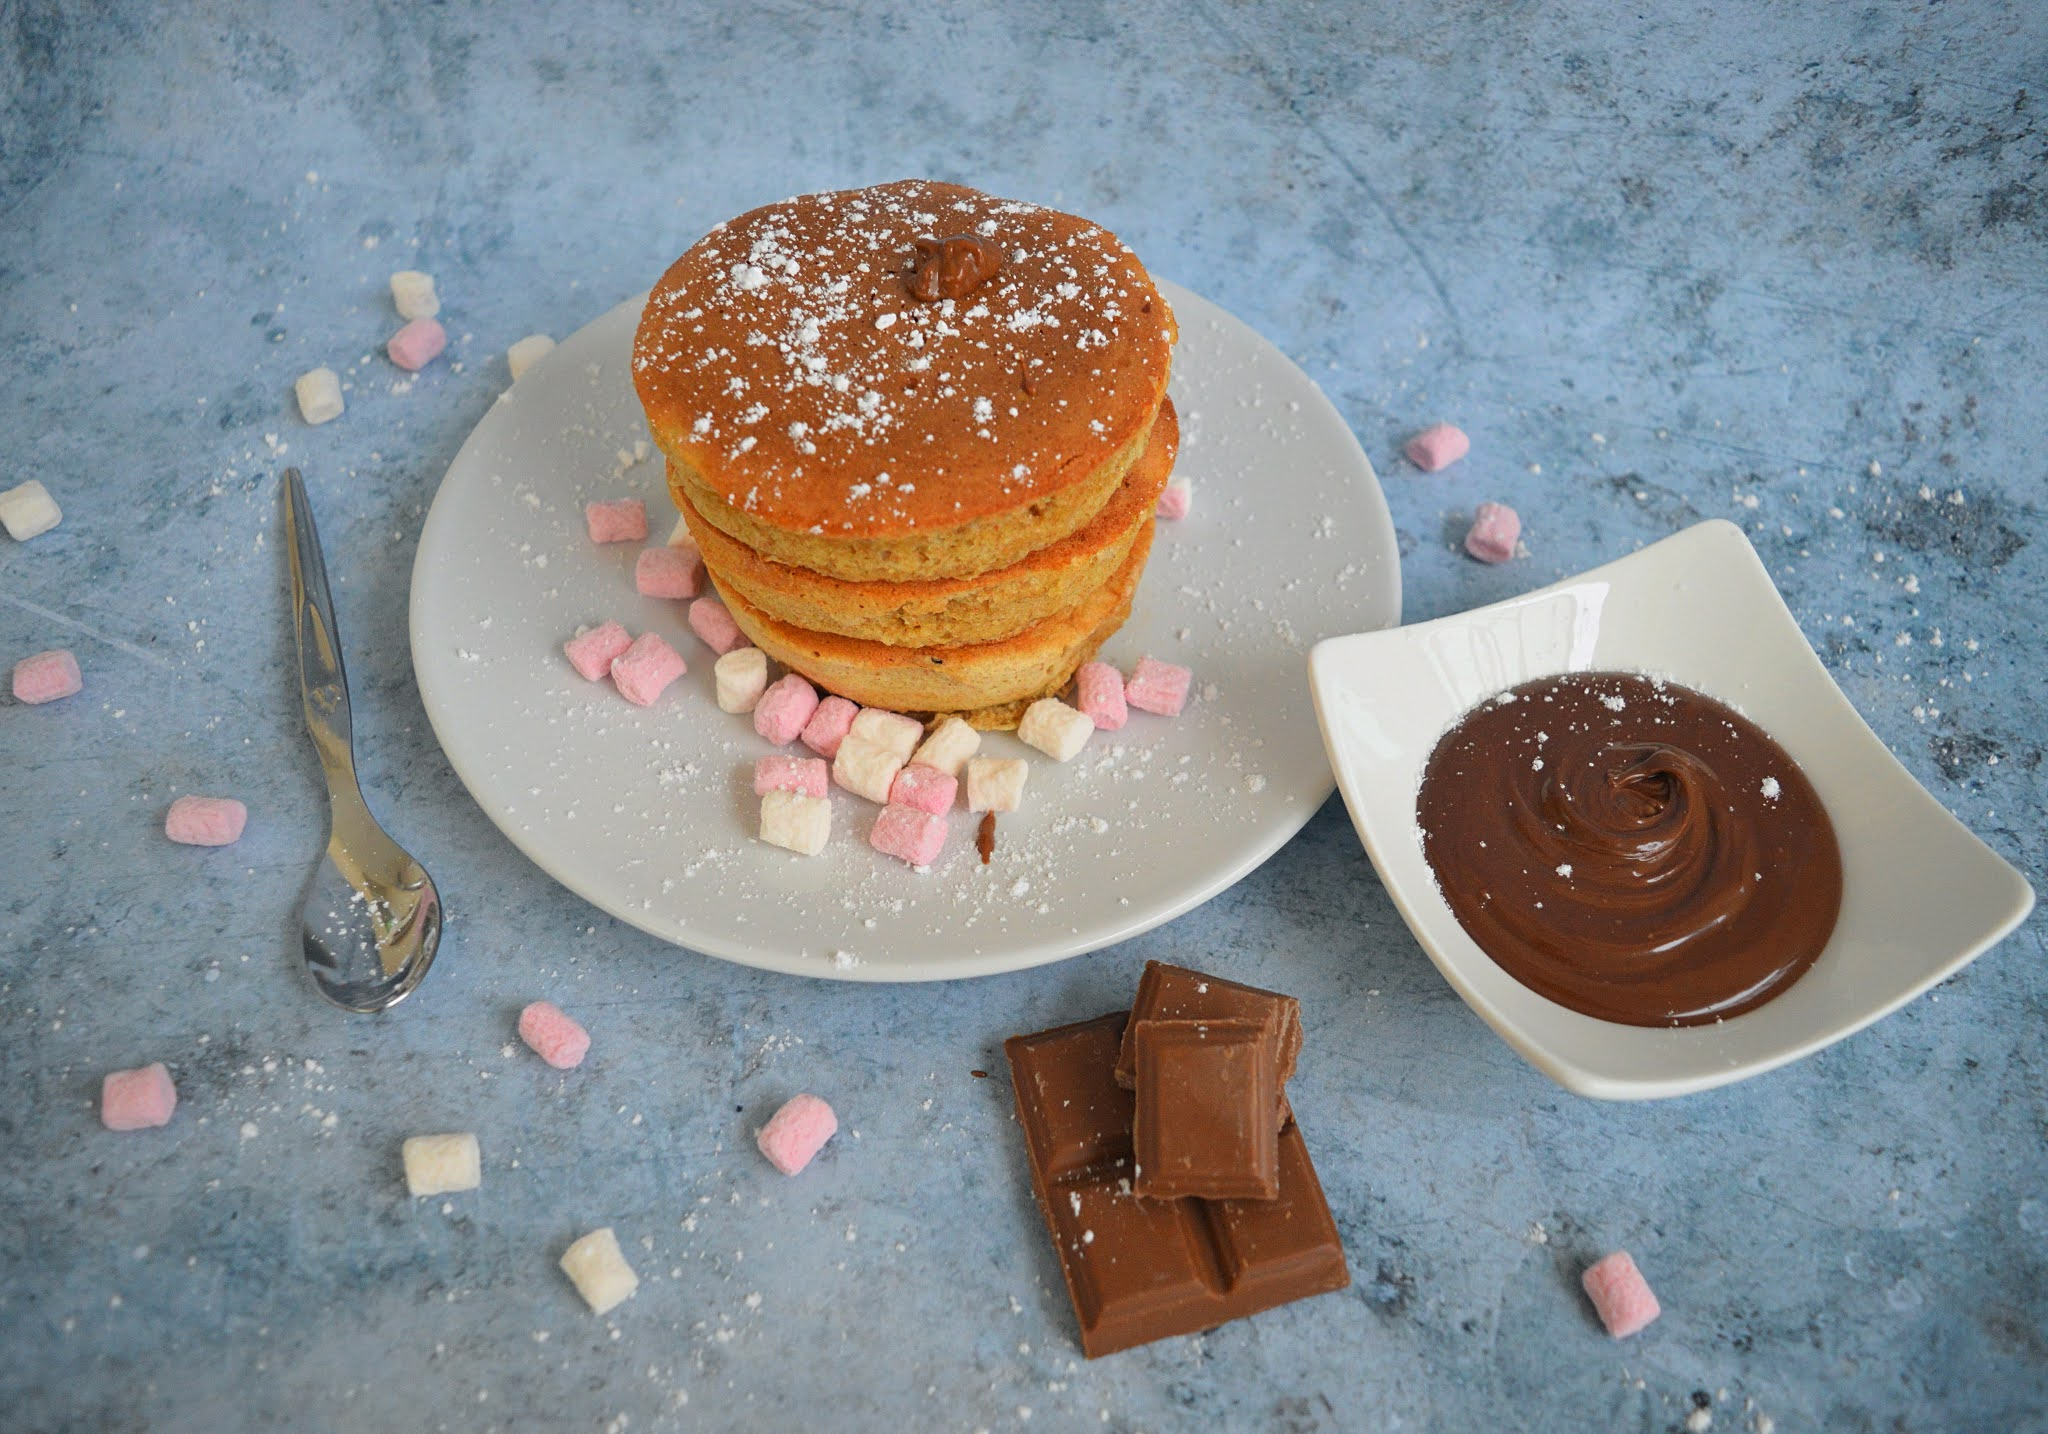 Final fluffy pancakes